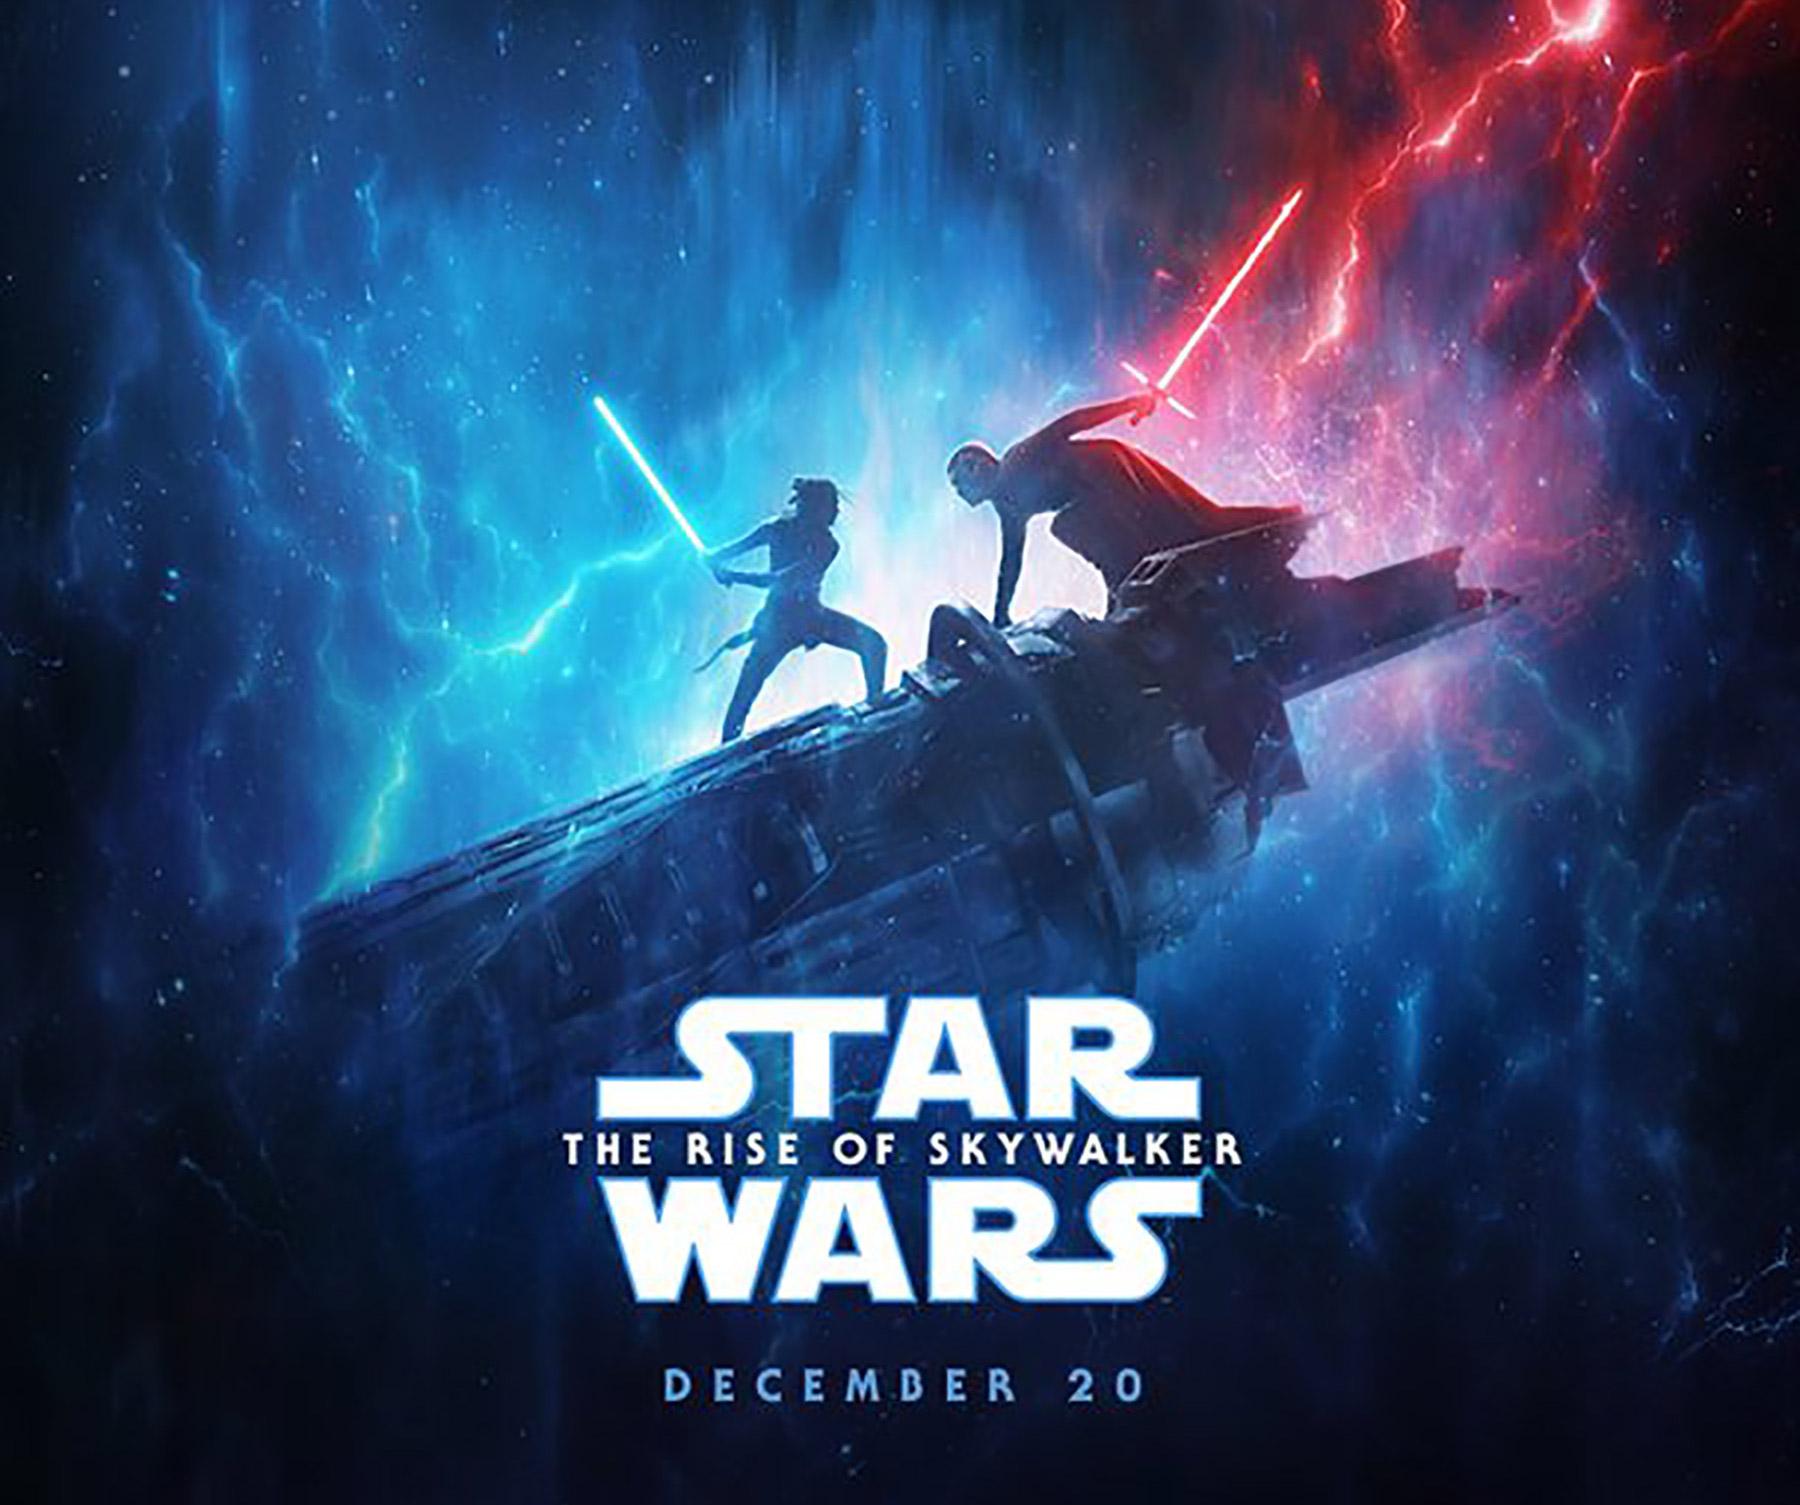 Star-Wars-The-Rise-Of-Skywalker-D23